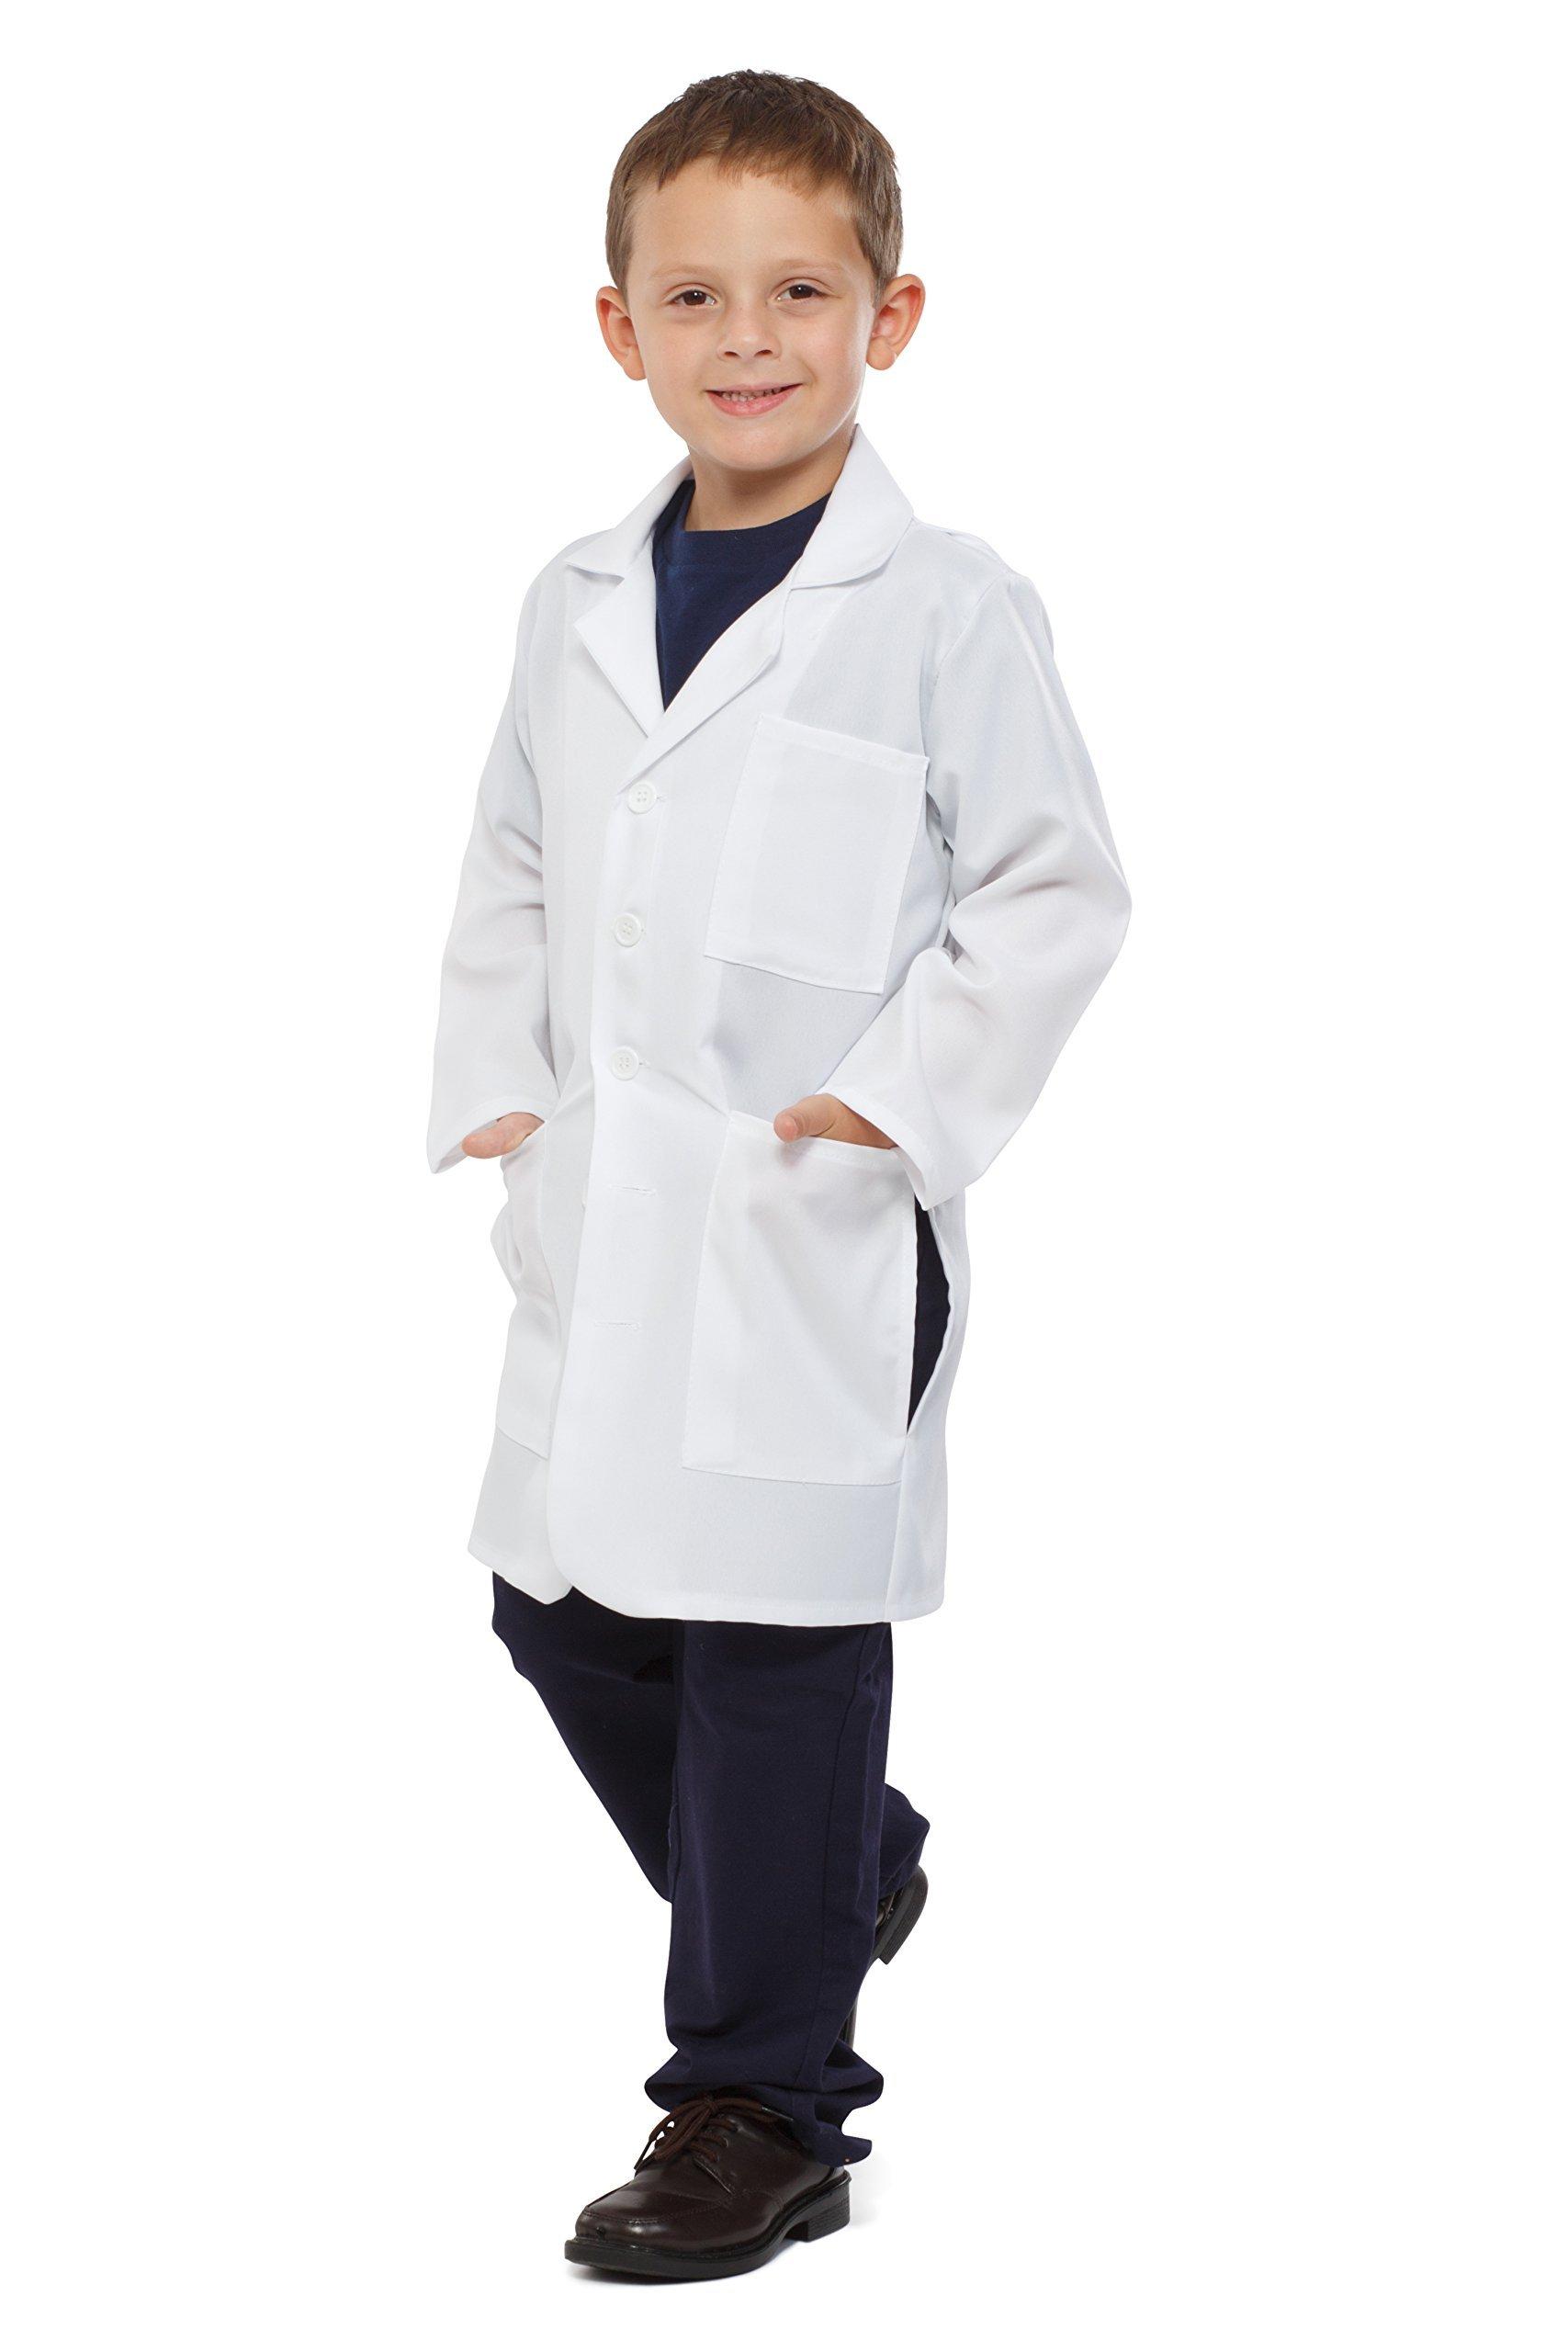 Kid Doc